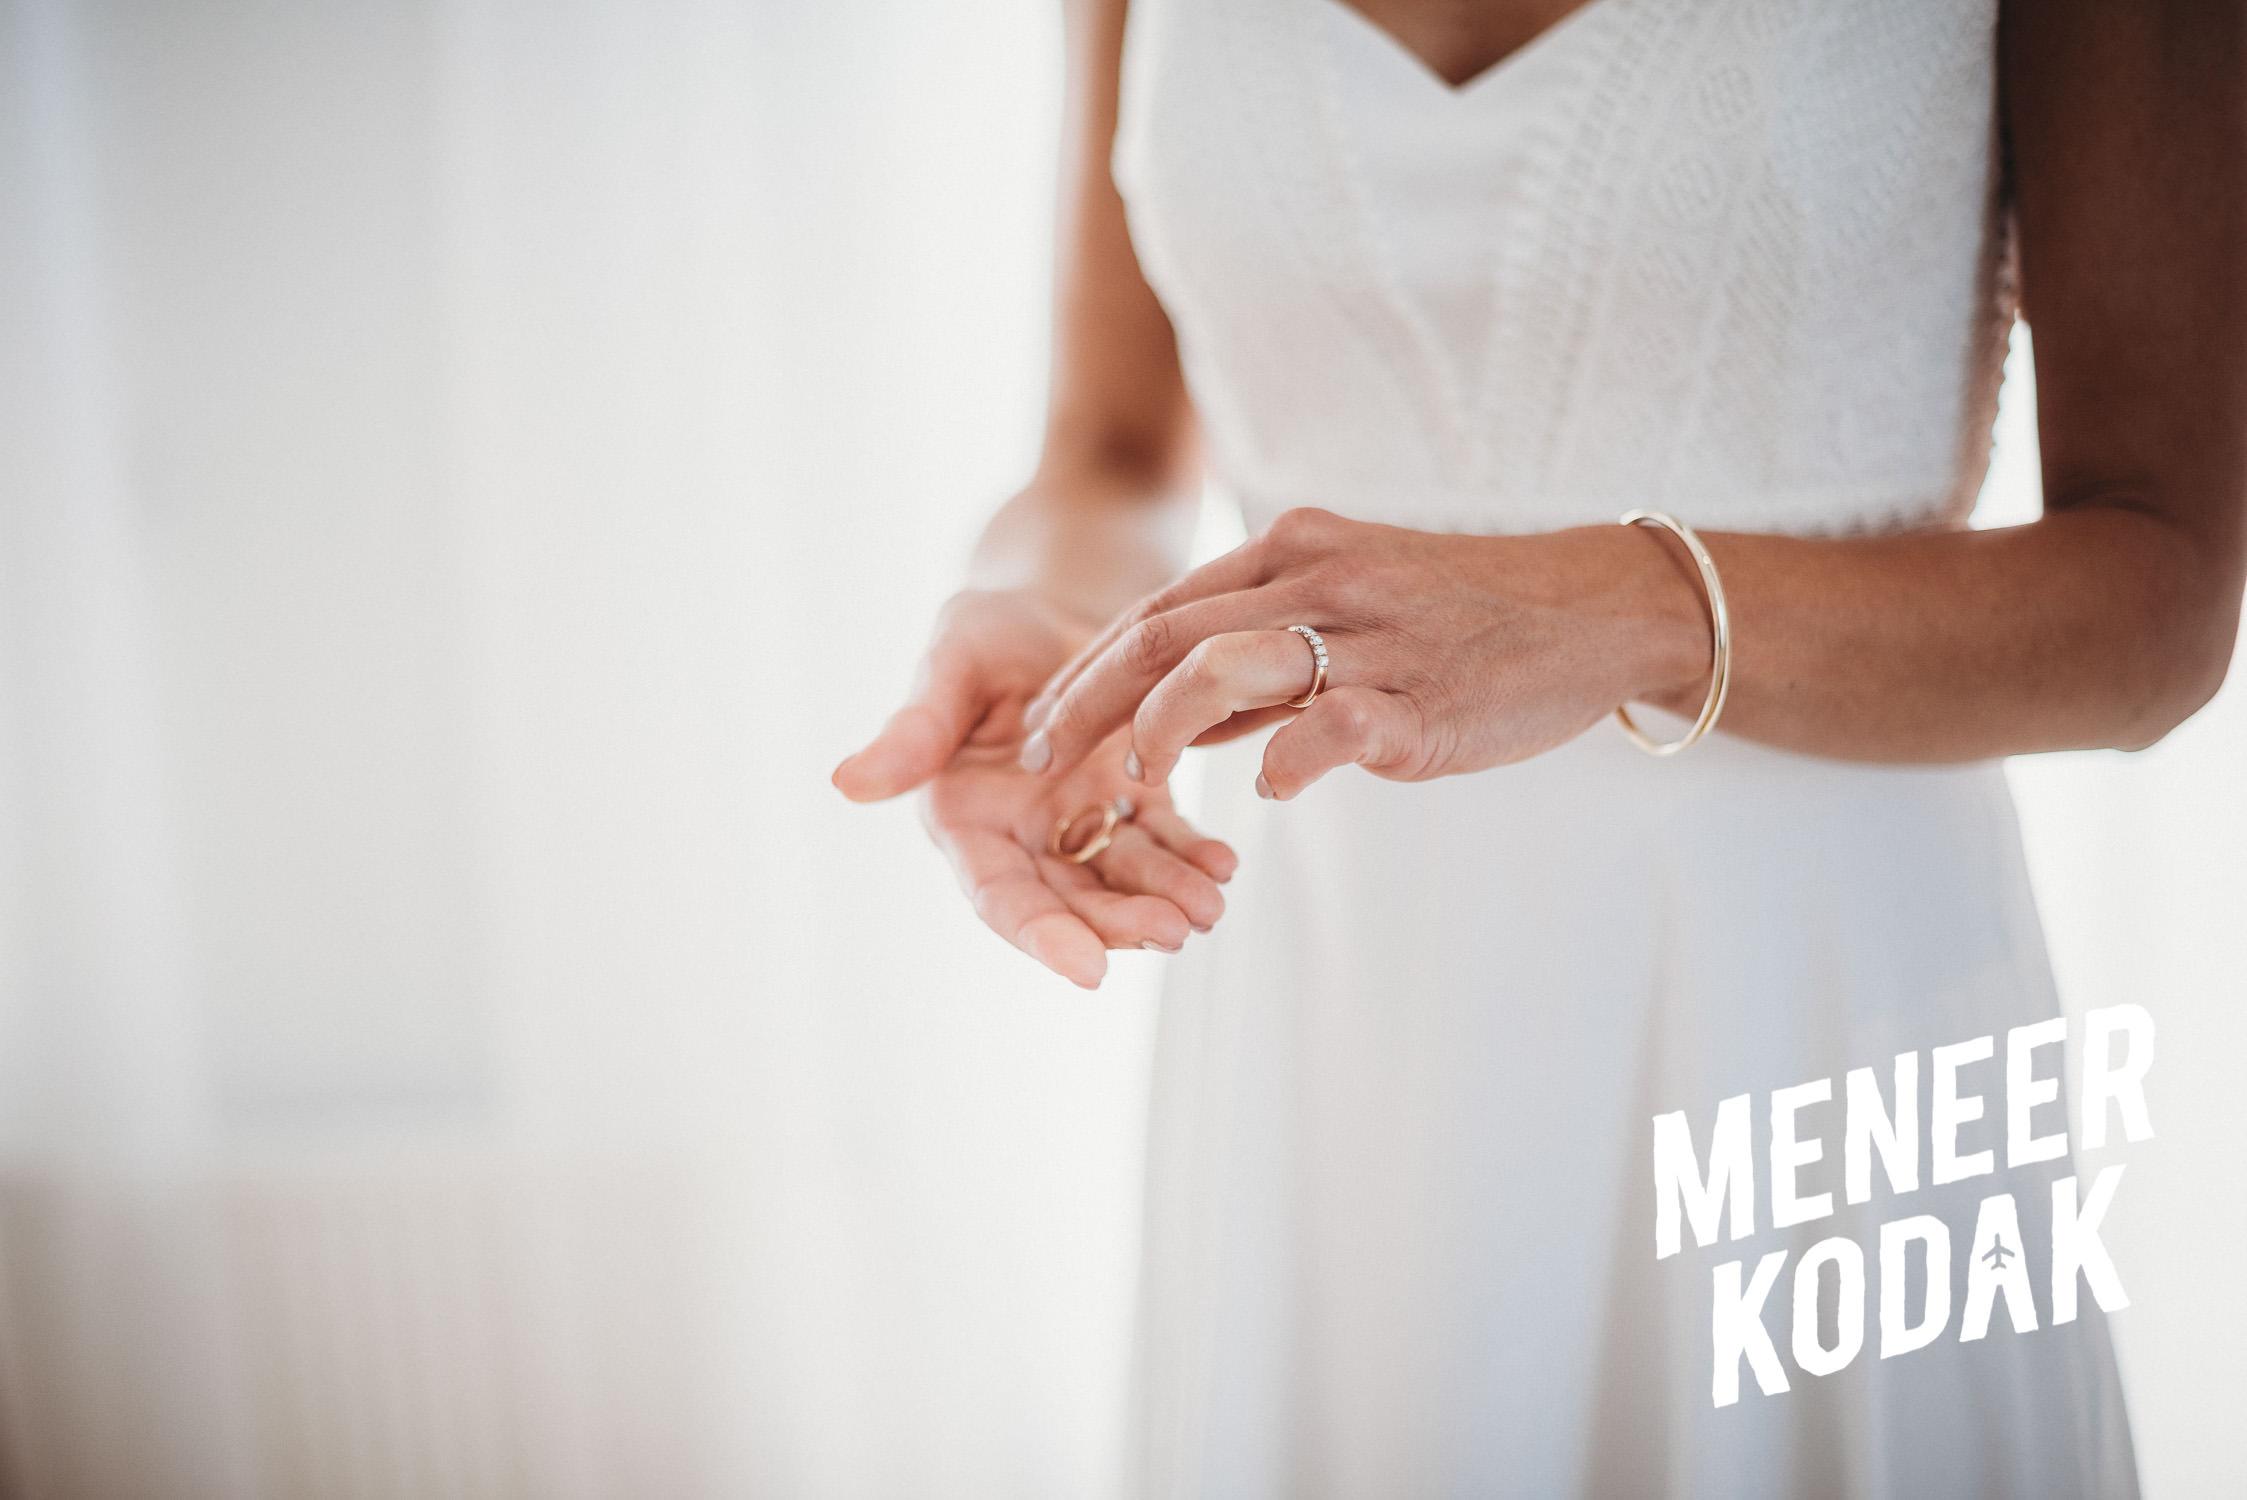 Meneer Kodak - Strandbruiloft - Noordwijk - K&A-070.jpg